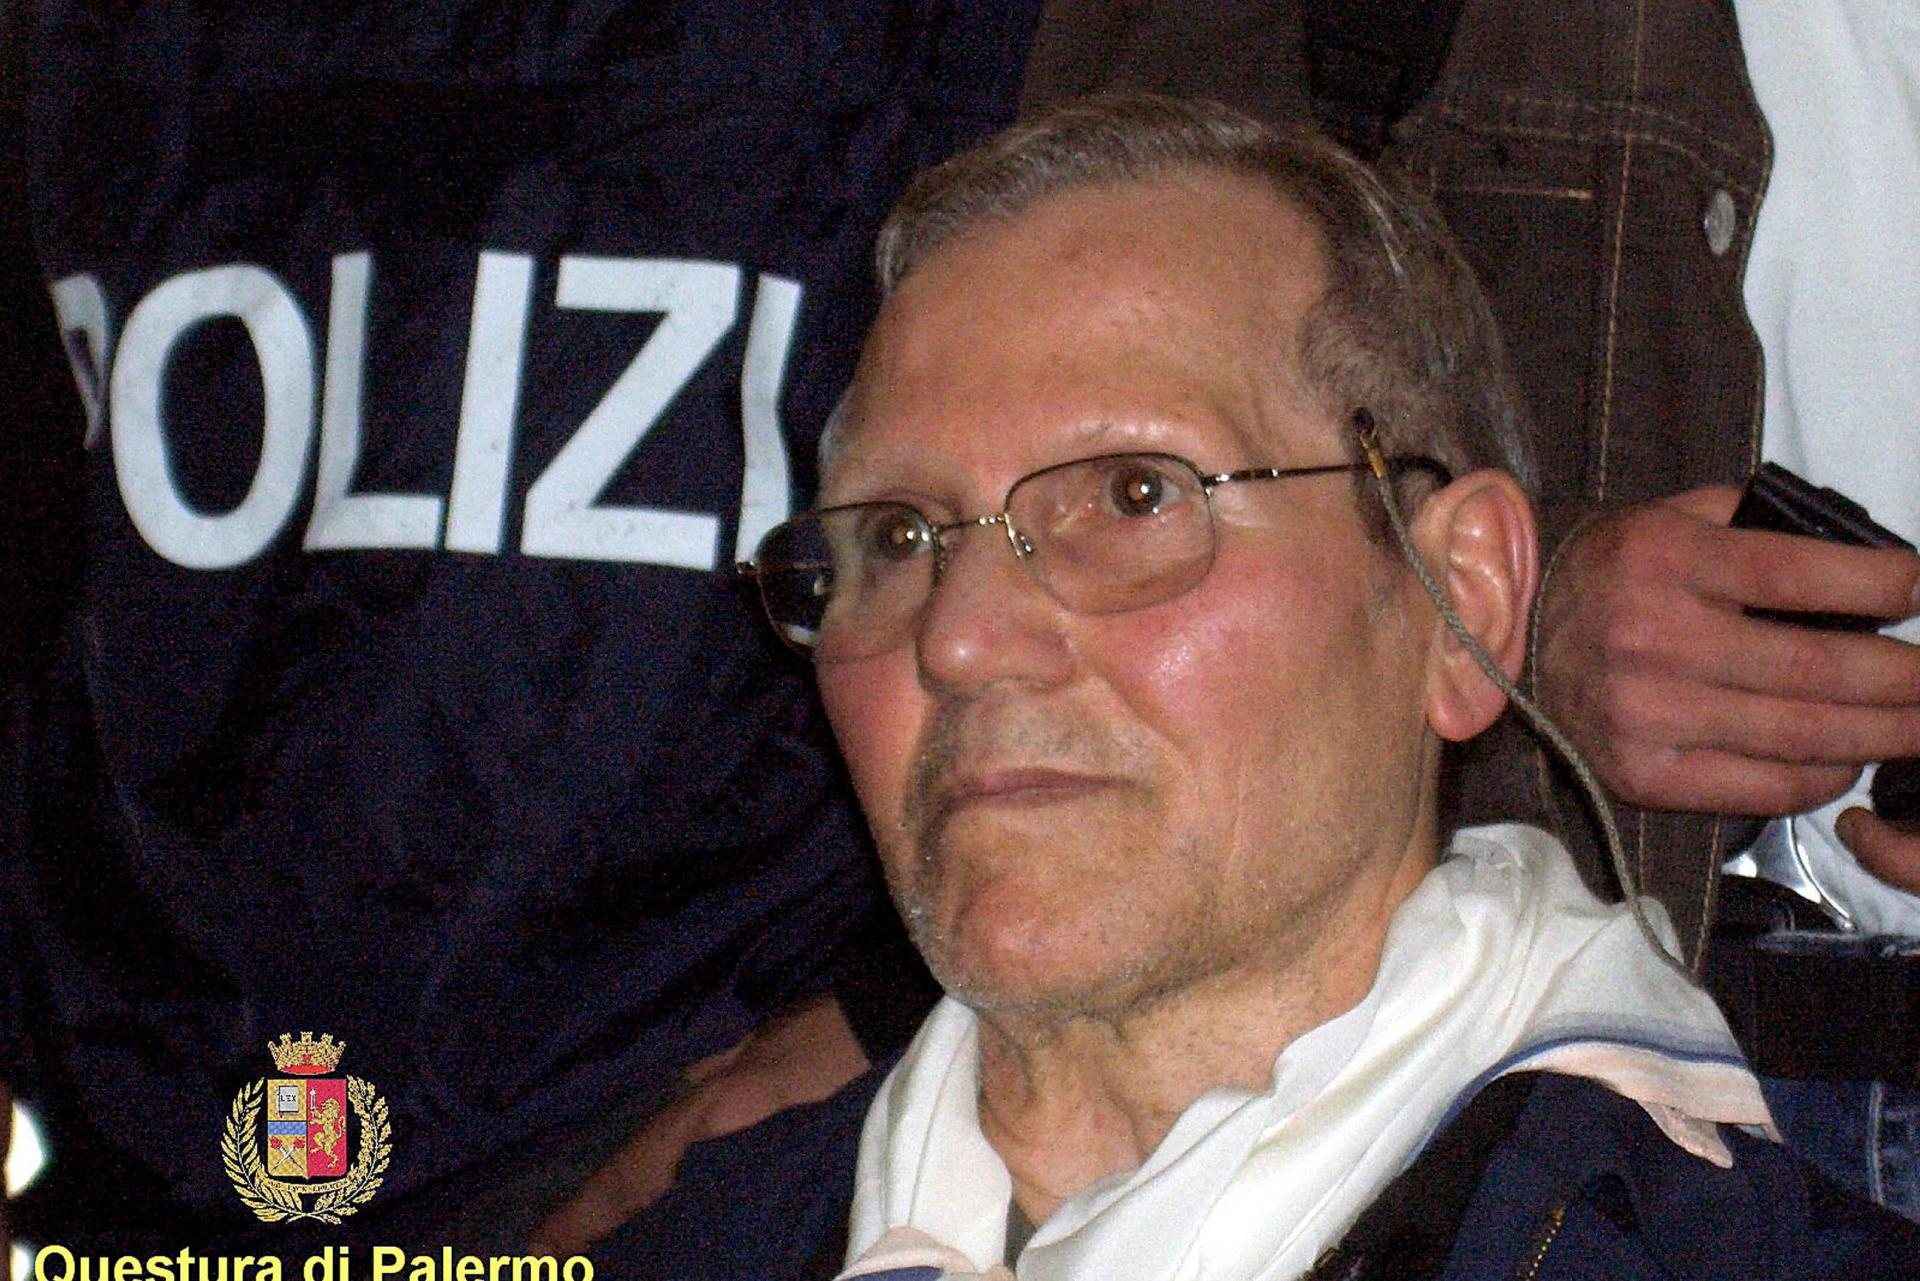 A handout picture of Mafia Boss Bernardo Provenzano taken 11 April 2006 at Palermo's police headquarters following his arrest. Photo: HO/AFP